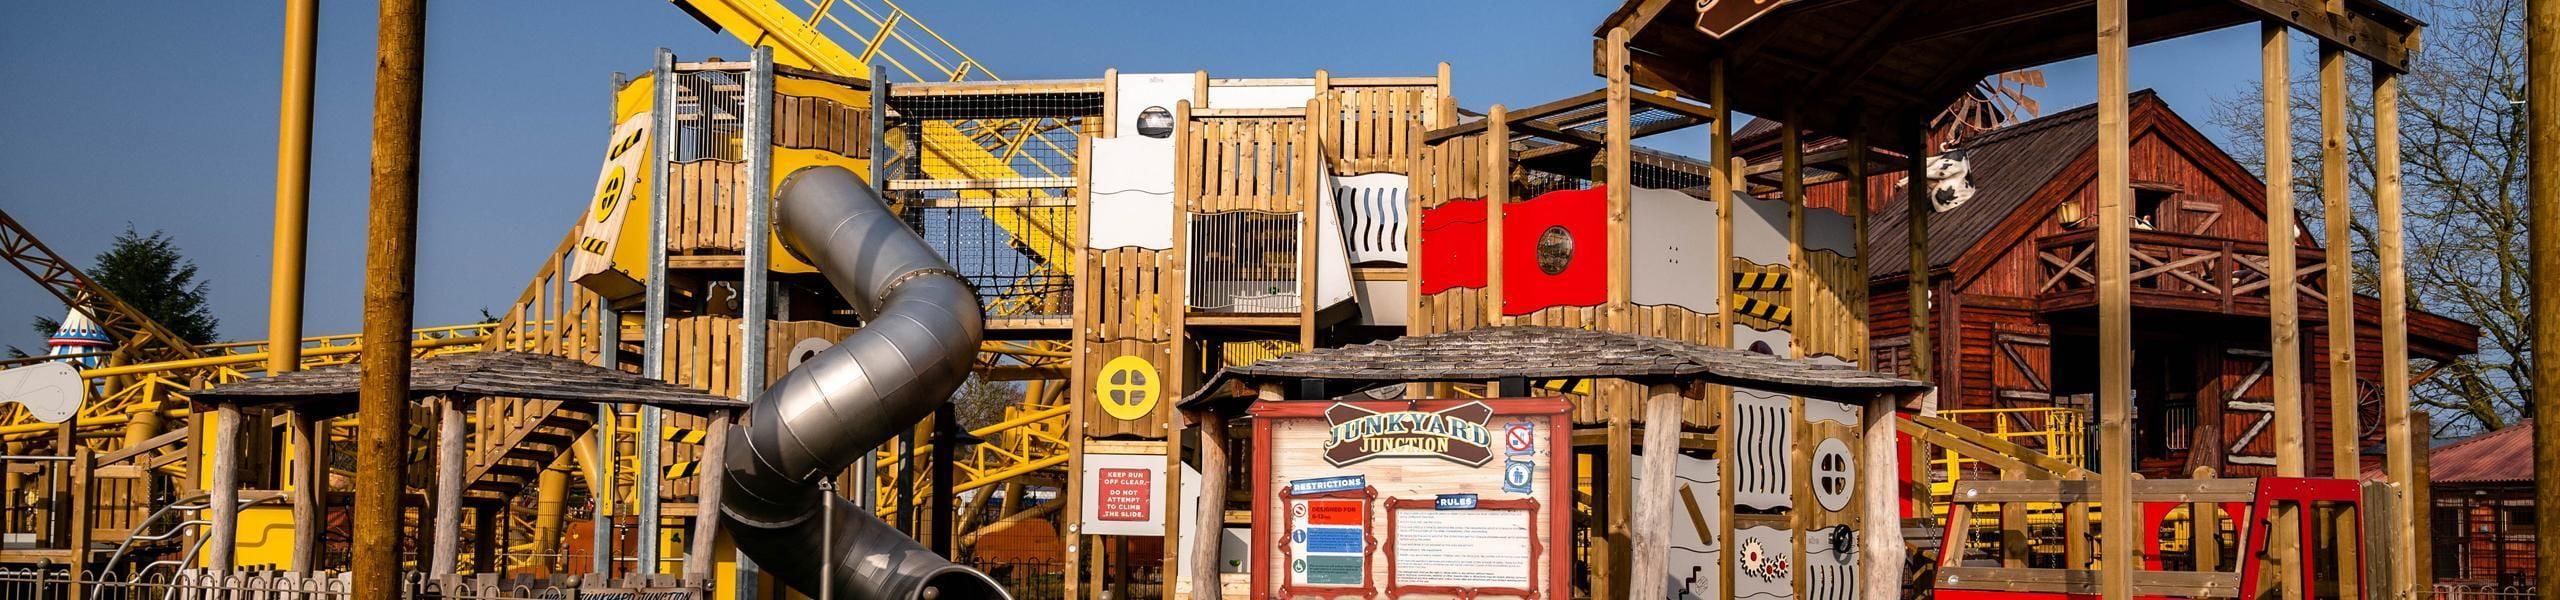 Junkyard Junction Adventure Play Area | Paultons Park